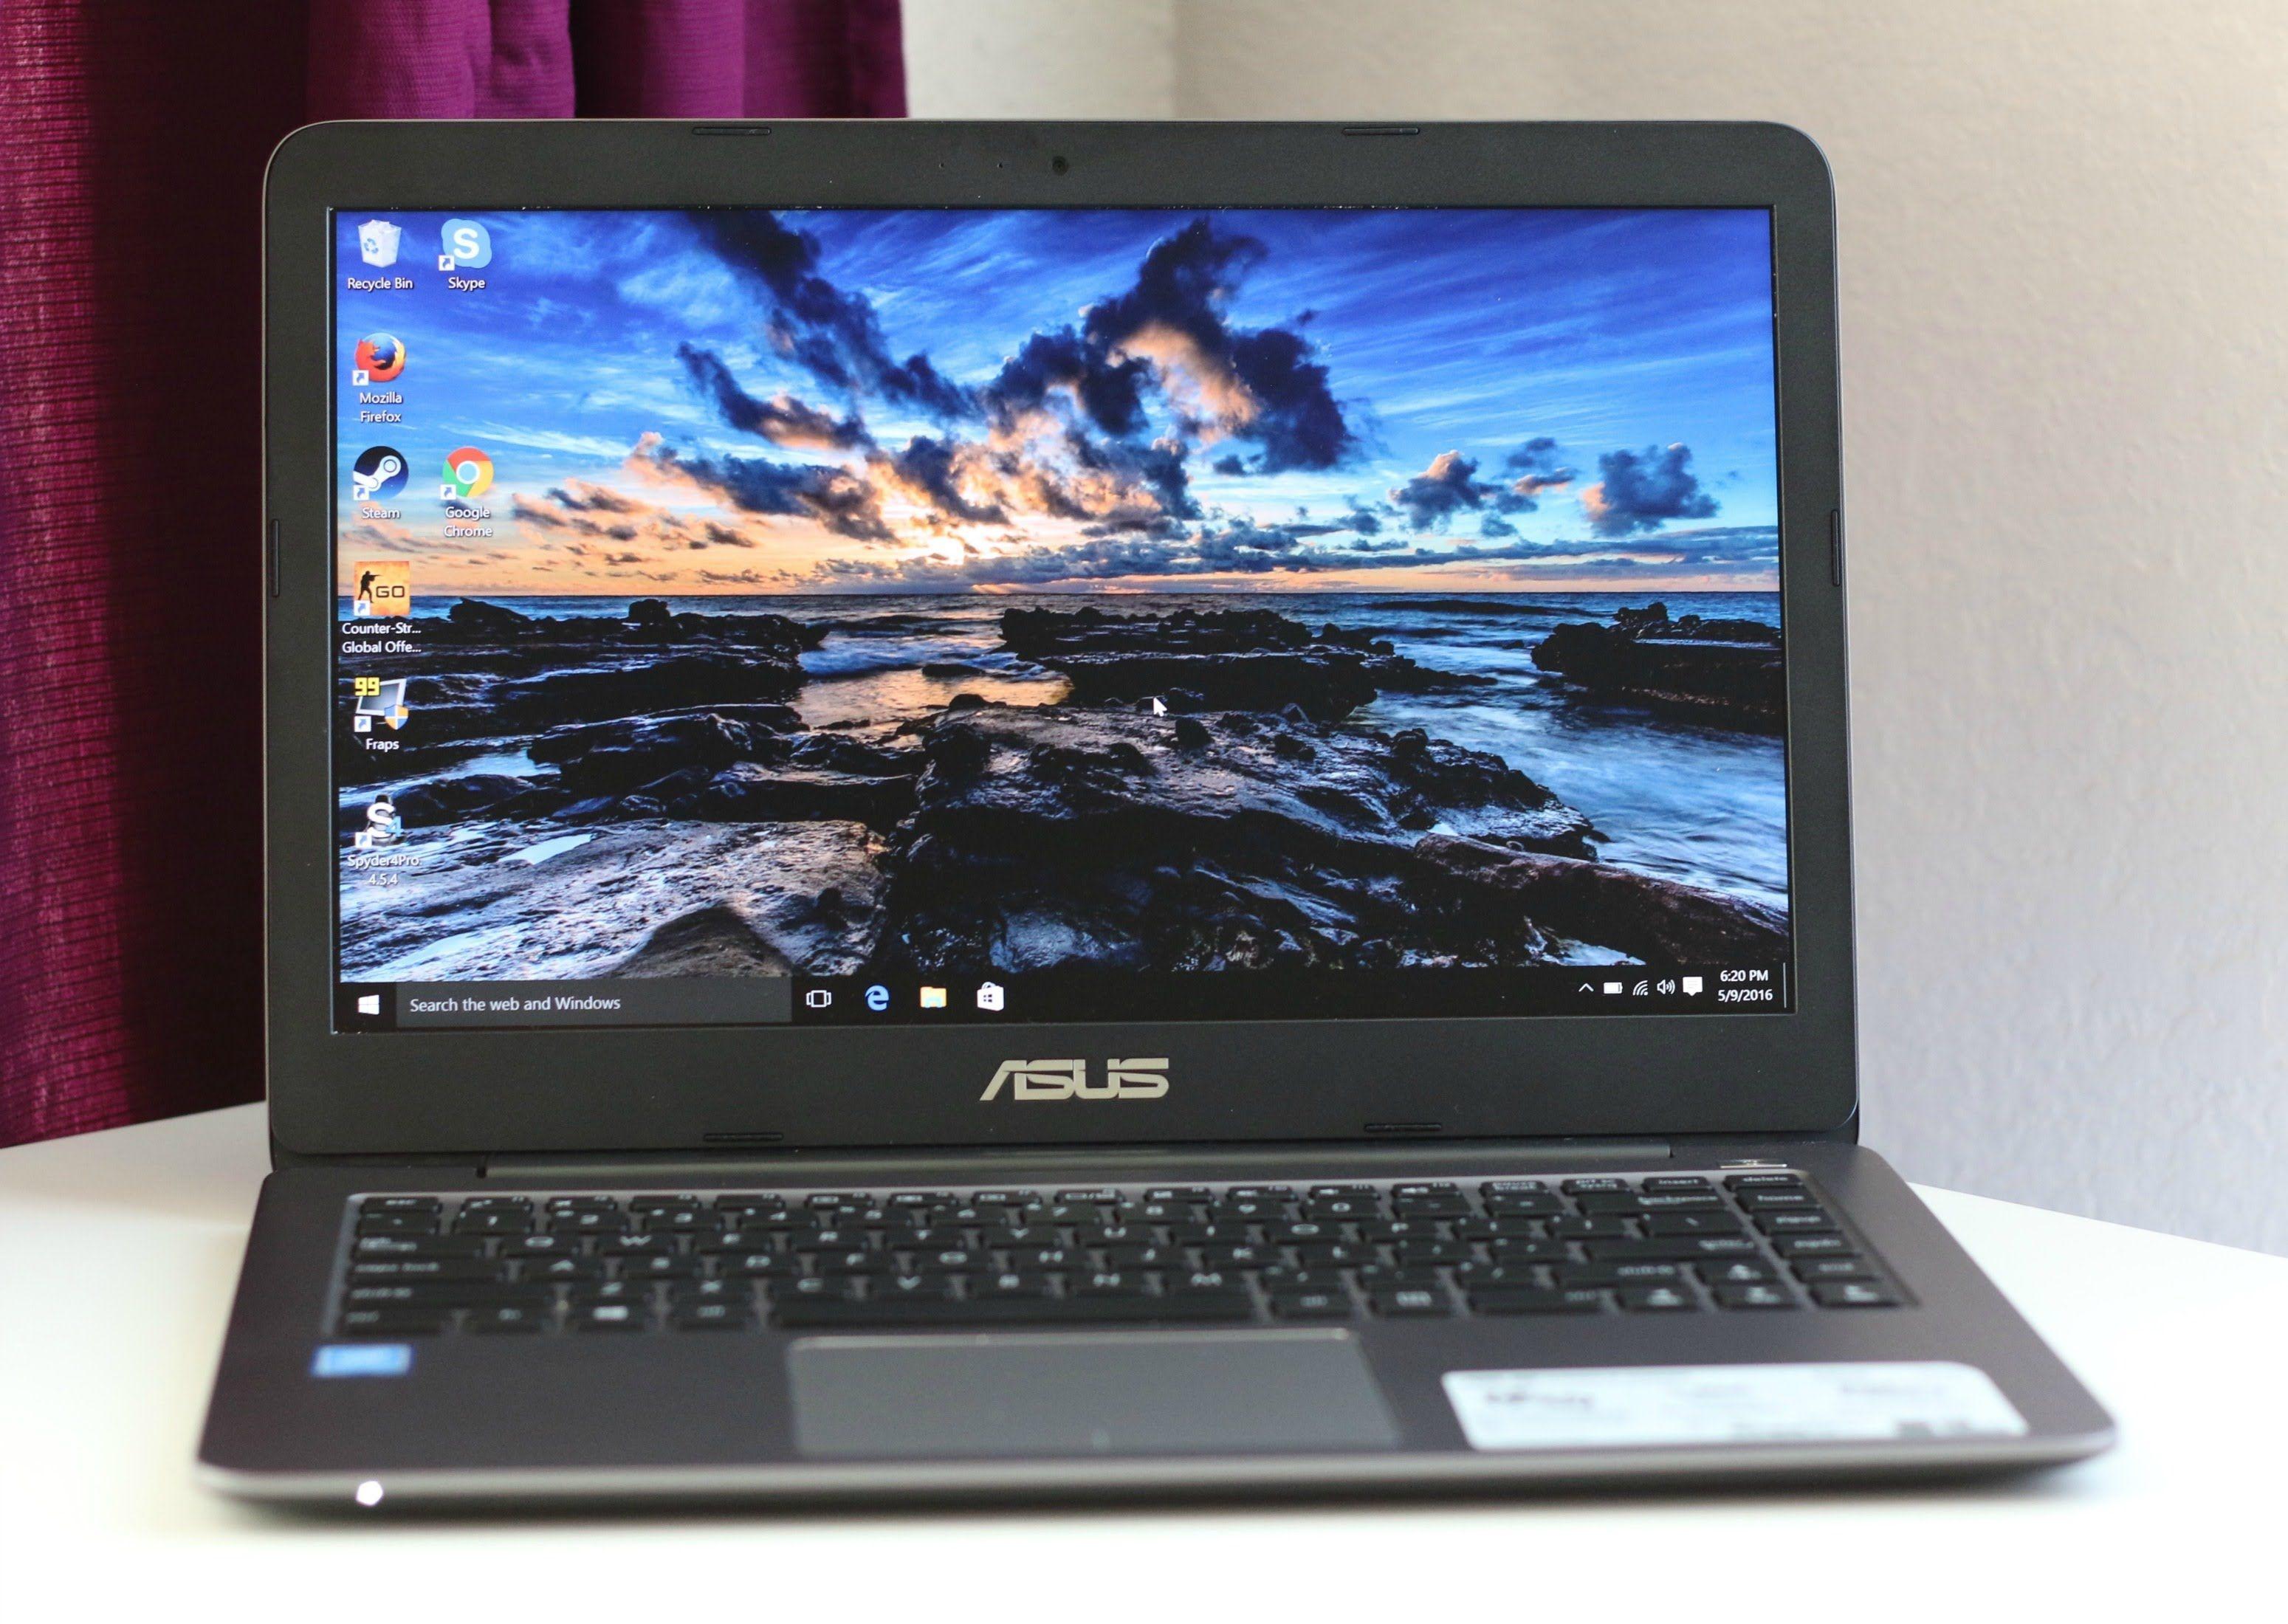 Asus N61Jq Notebook Intel 1000 WiFi WLAN Windows 8